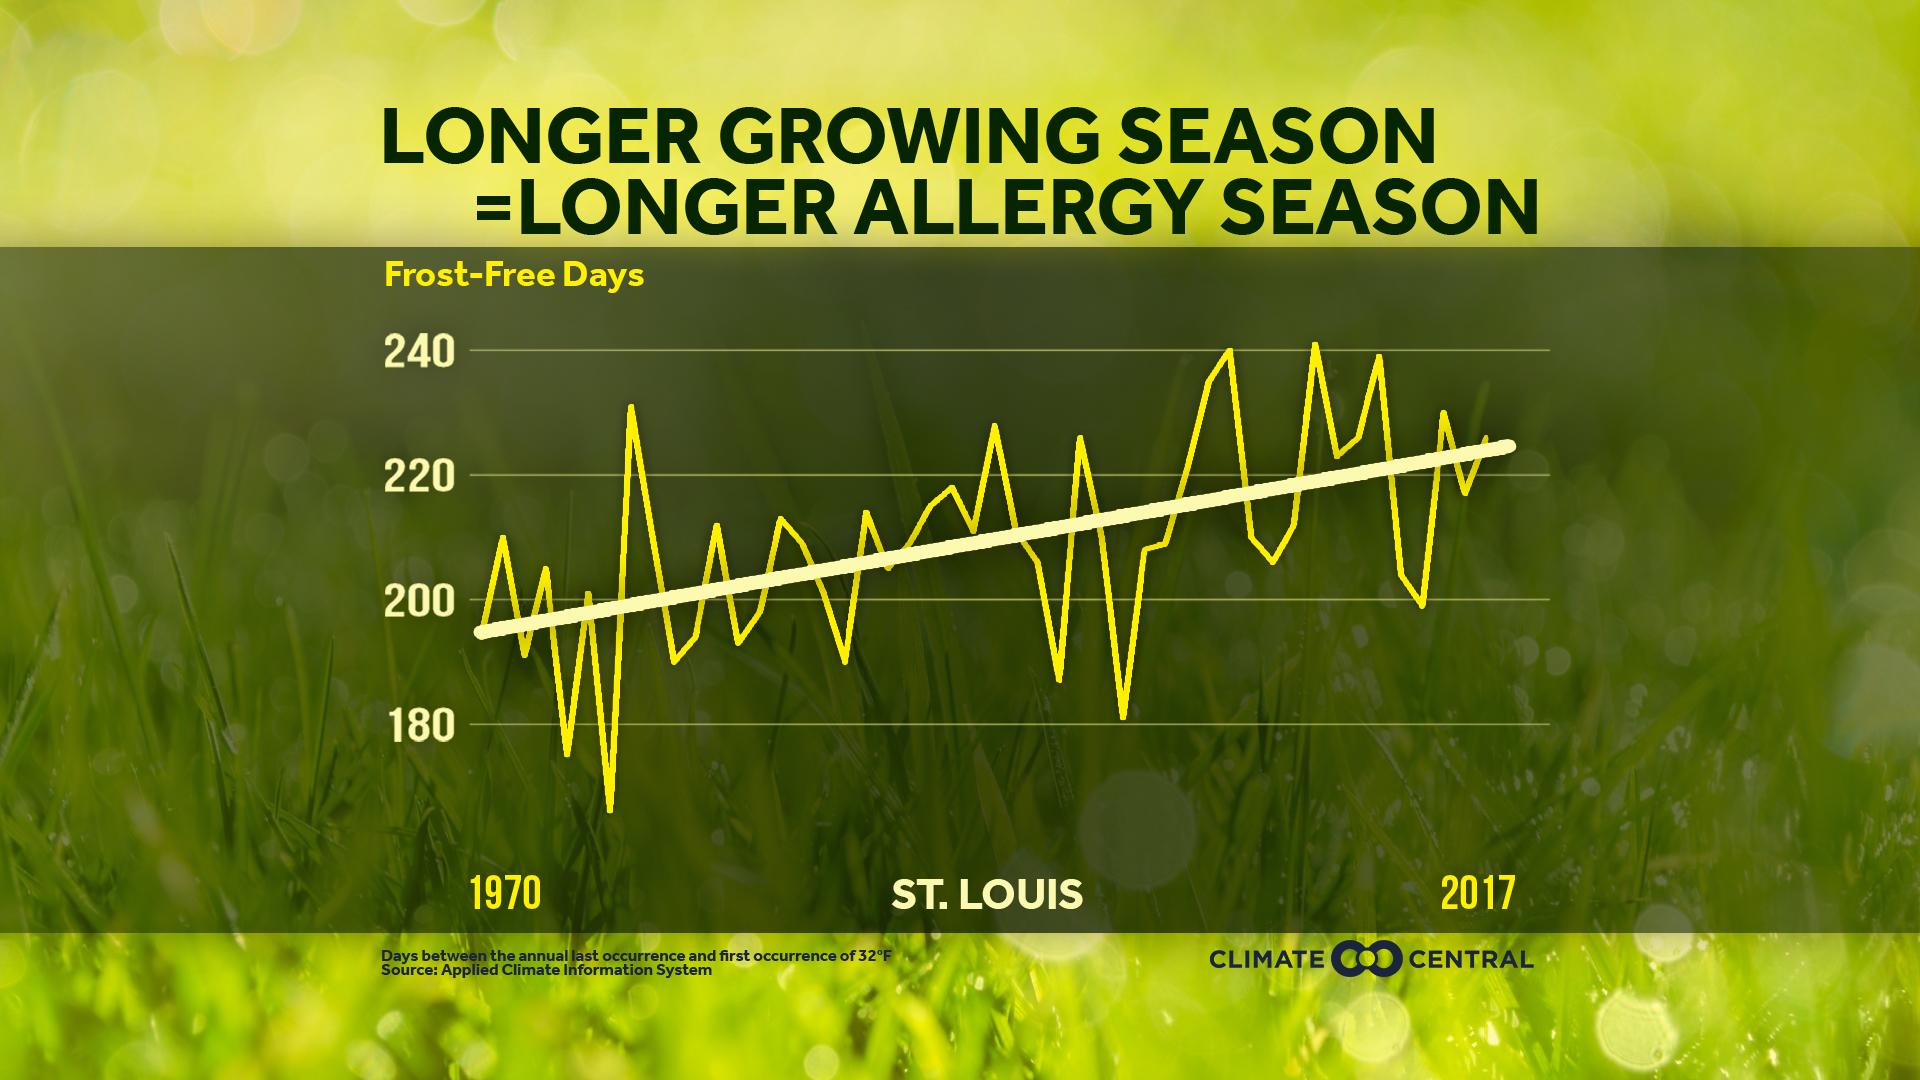 Longer Pollen Season